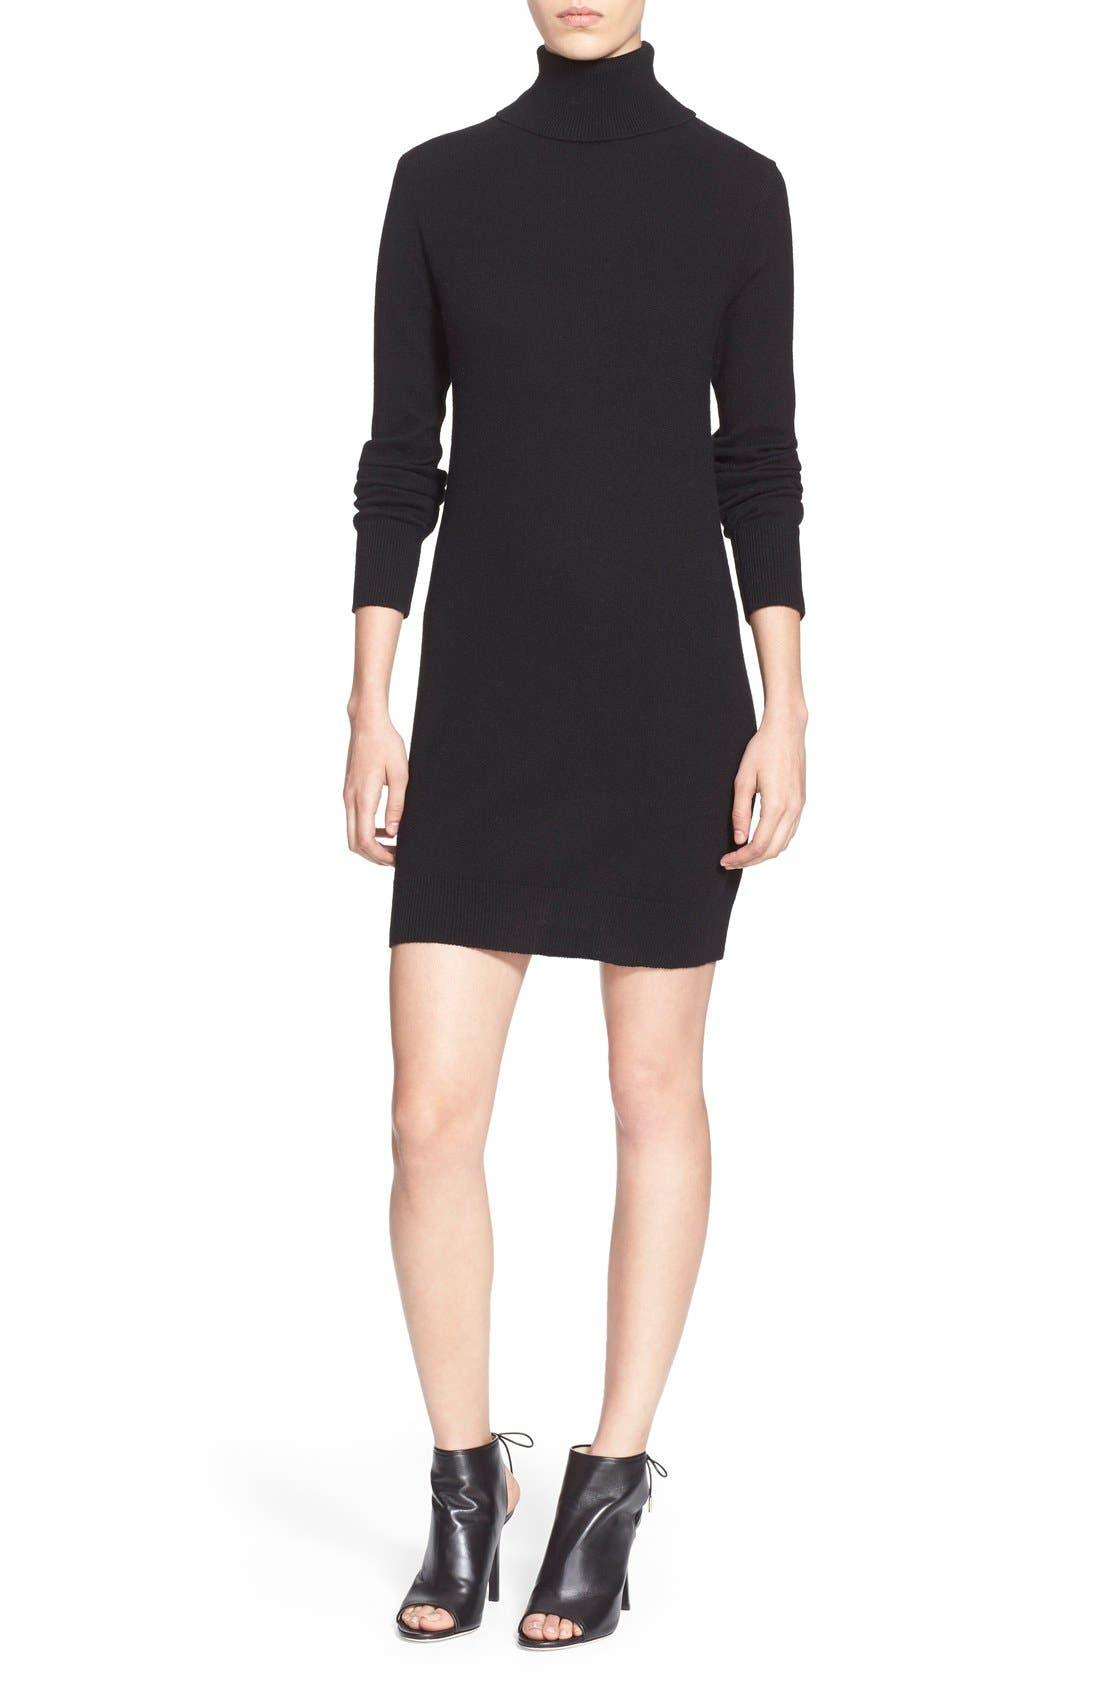 'Oscar' Turtleneck Sweater Dress,                             Main thumbnail 1, color,                             Black